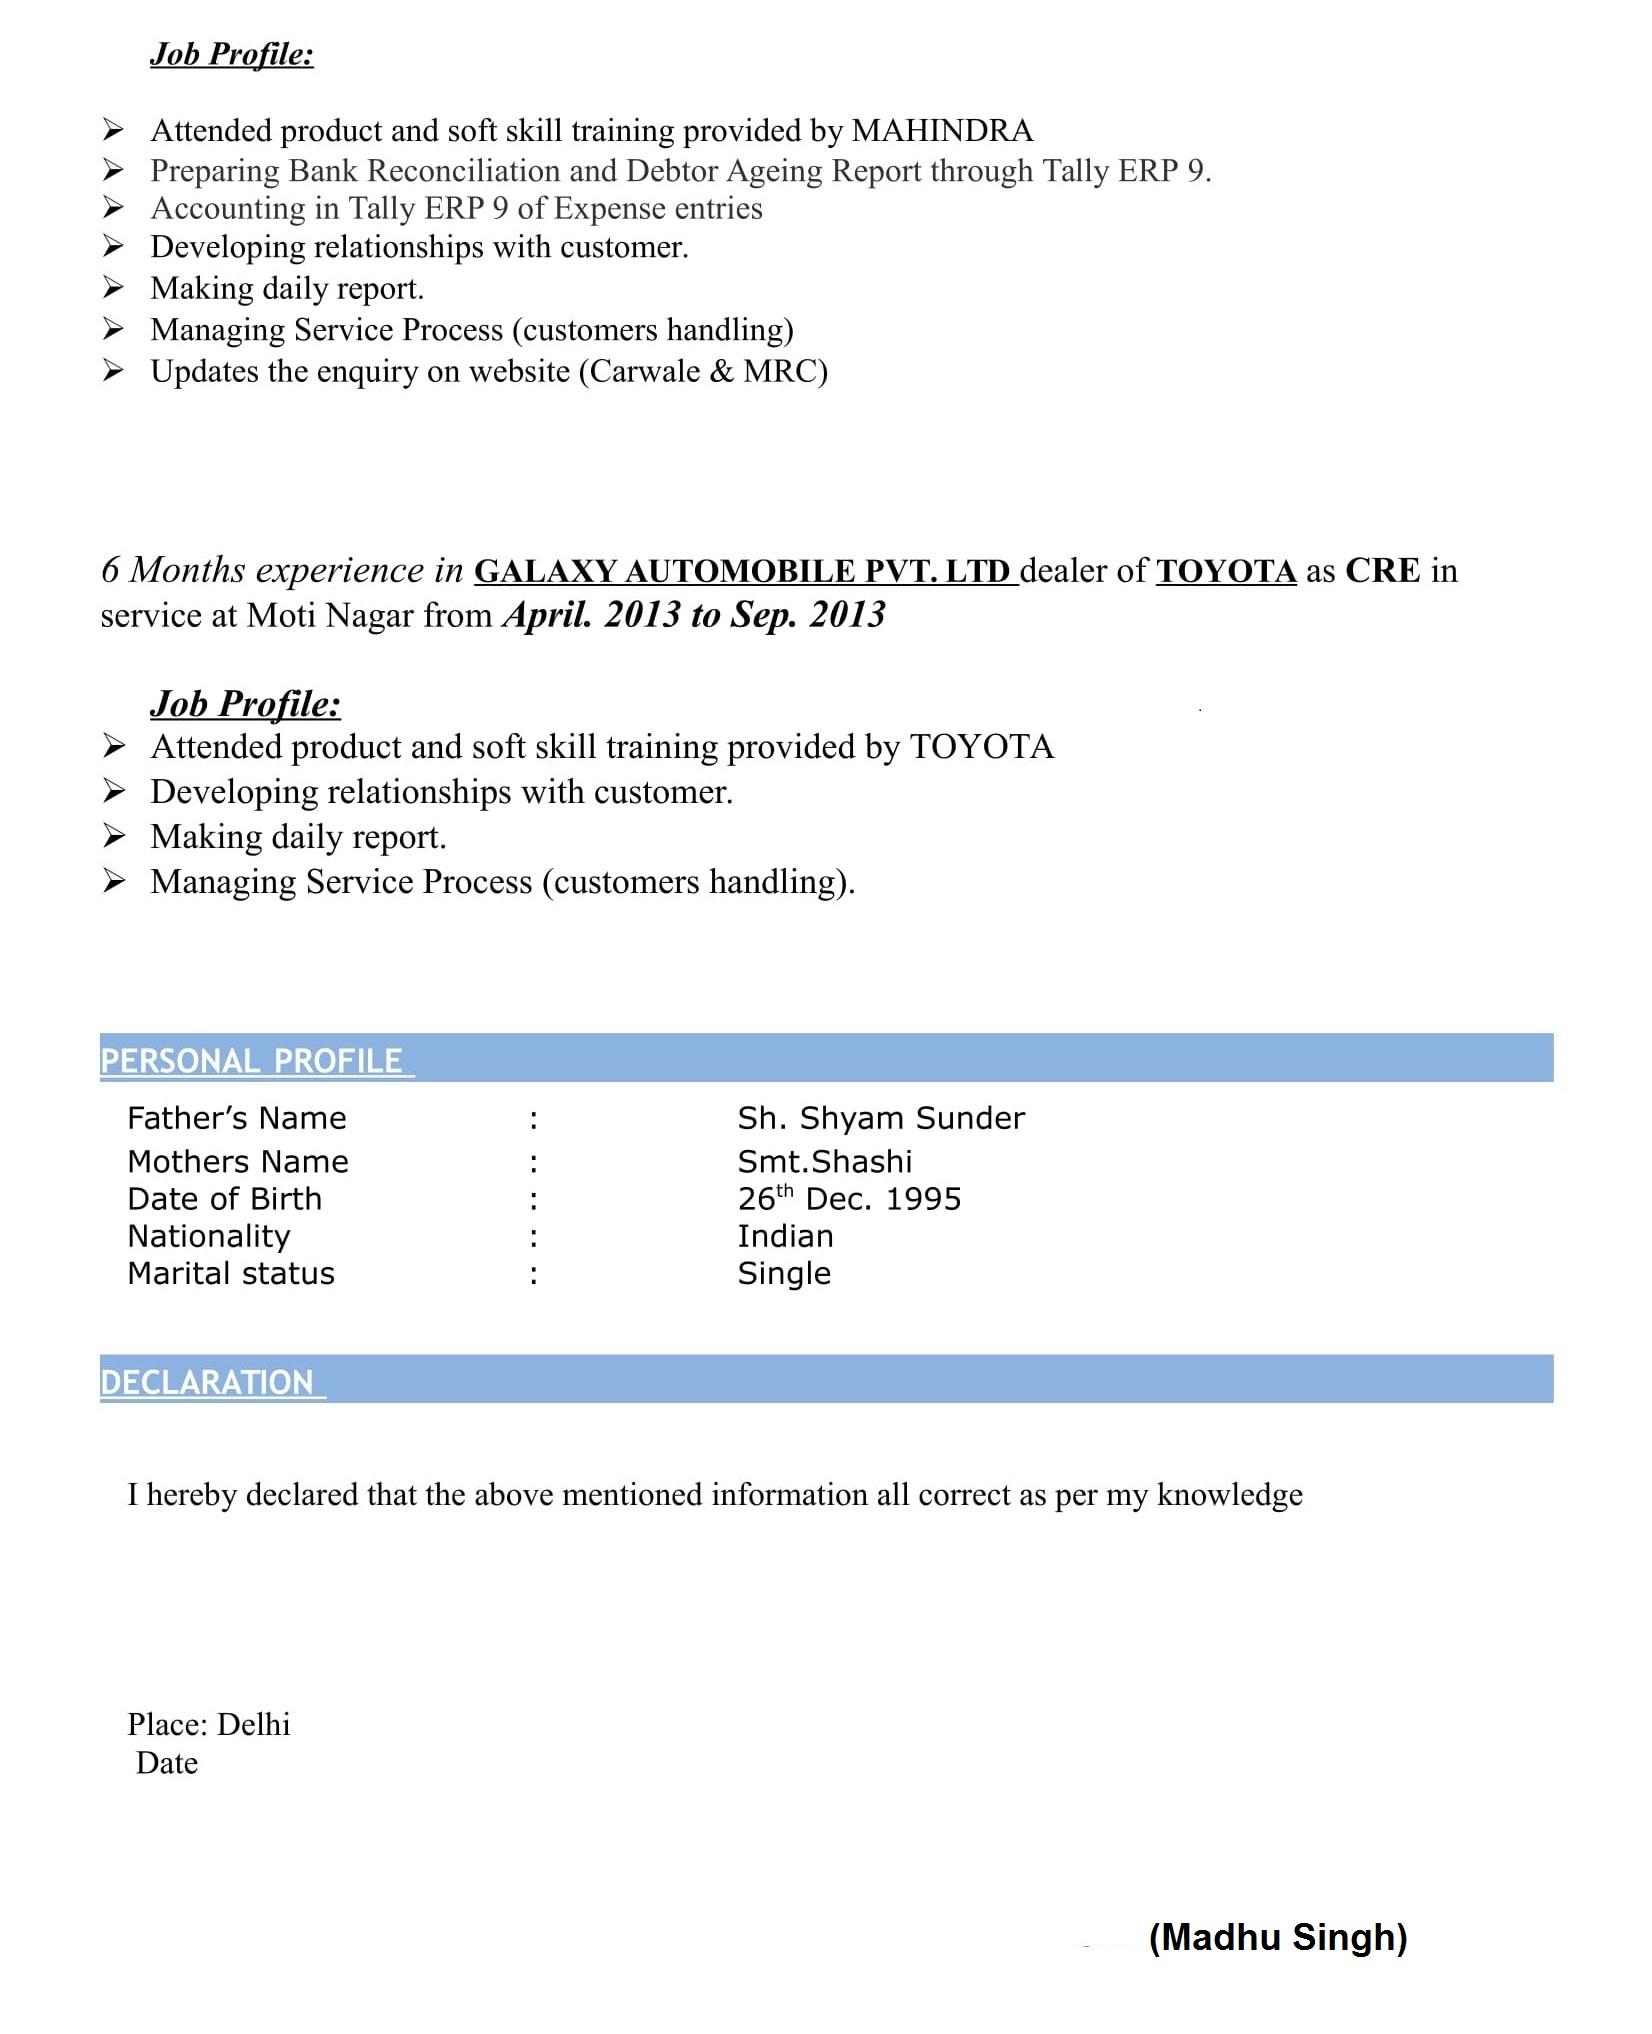 CV JYOTI MALHOTRA-2.jpg